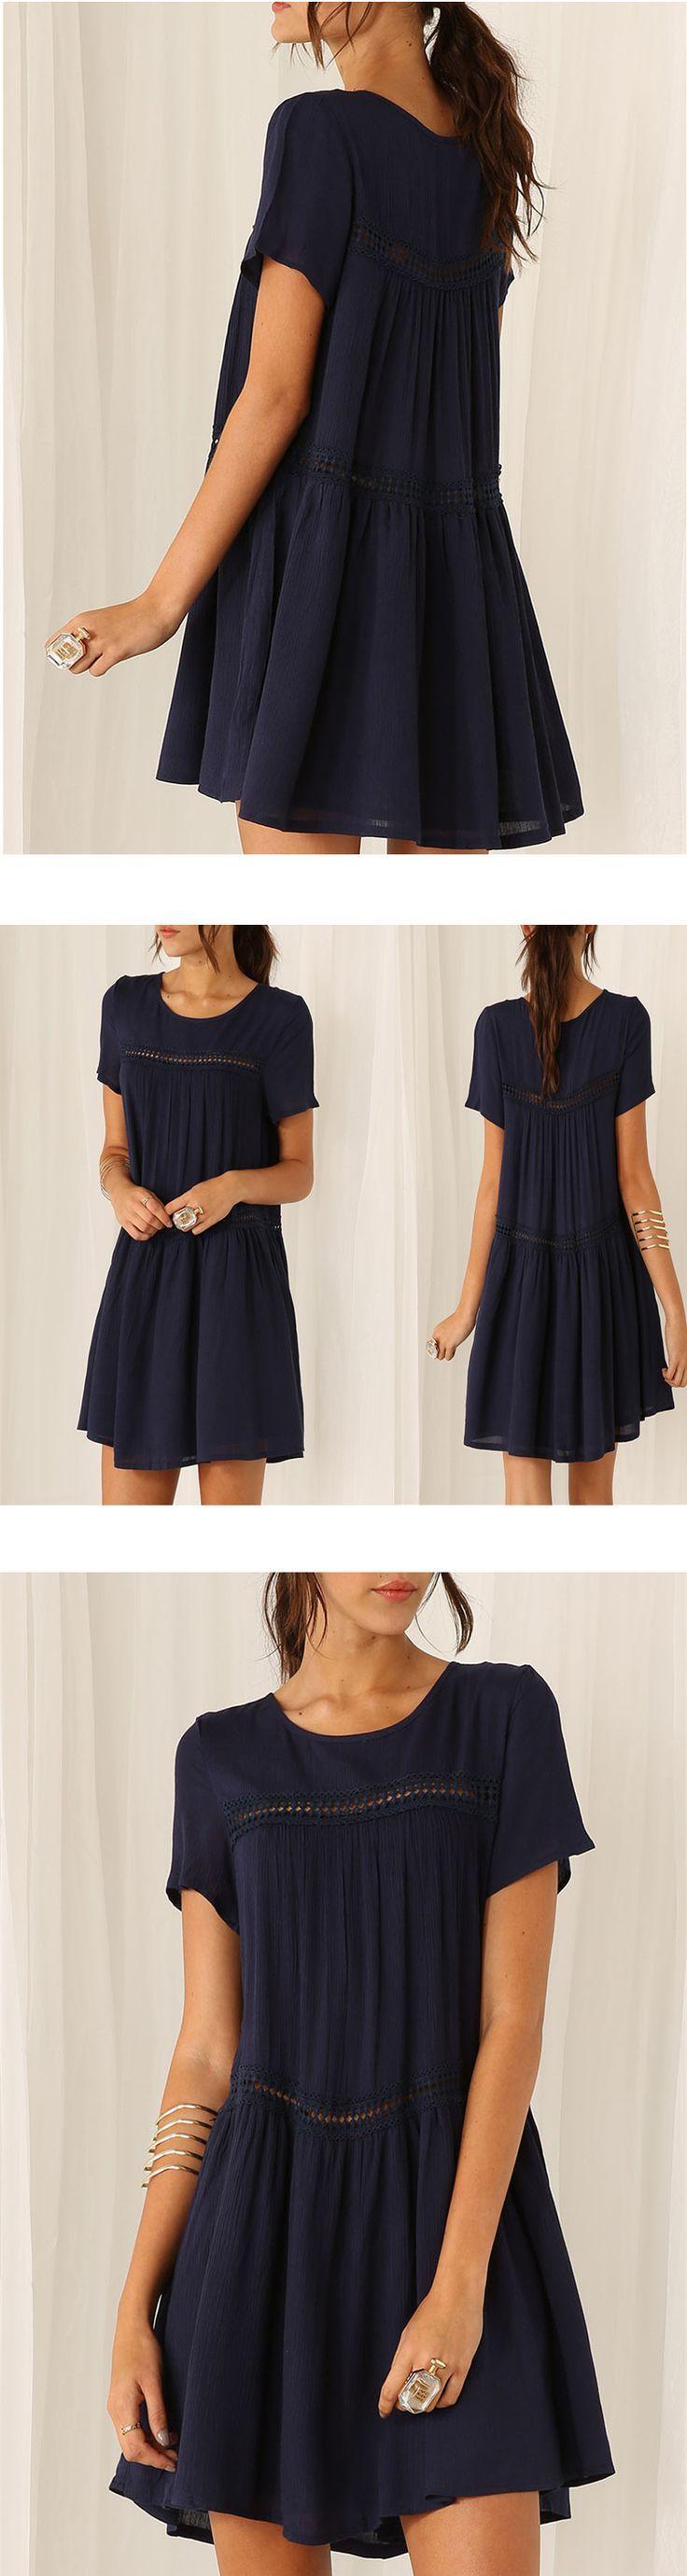 Navy Short Sleeve Shift Dress